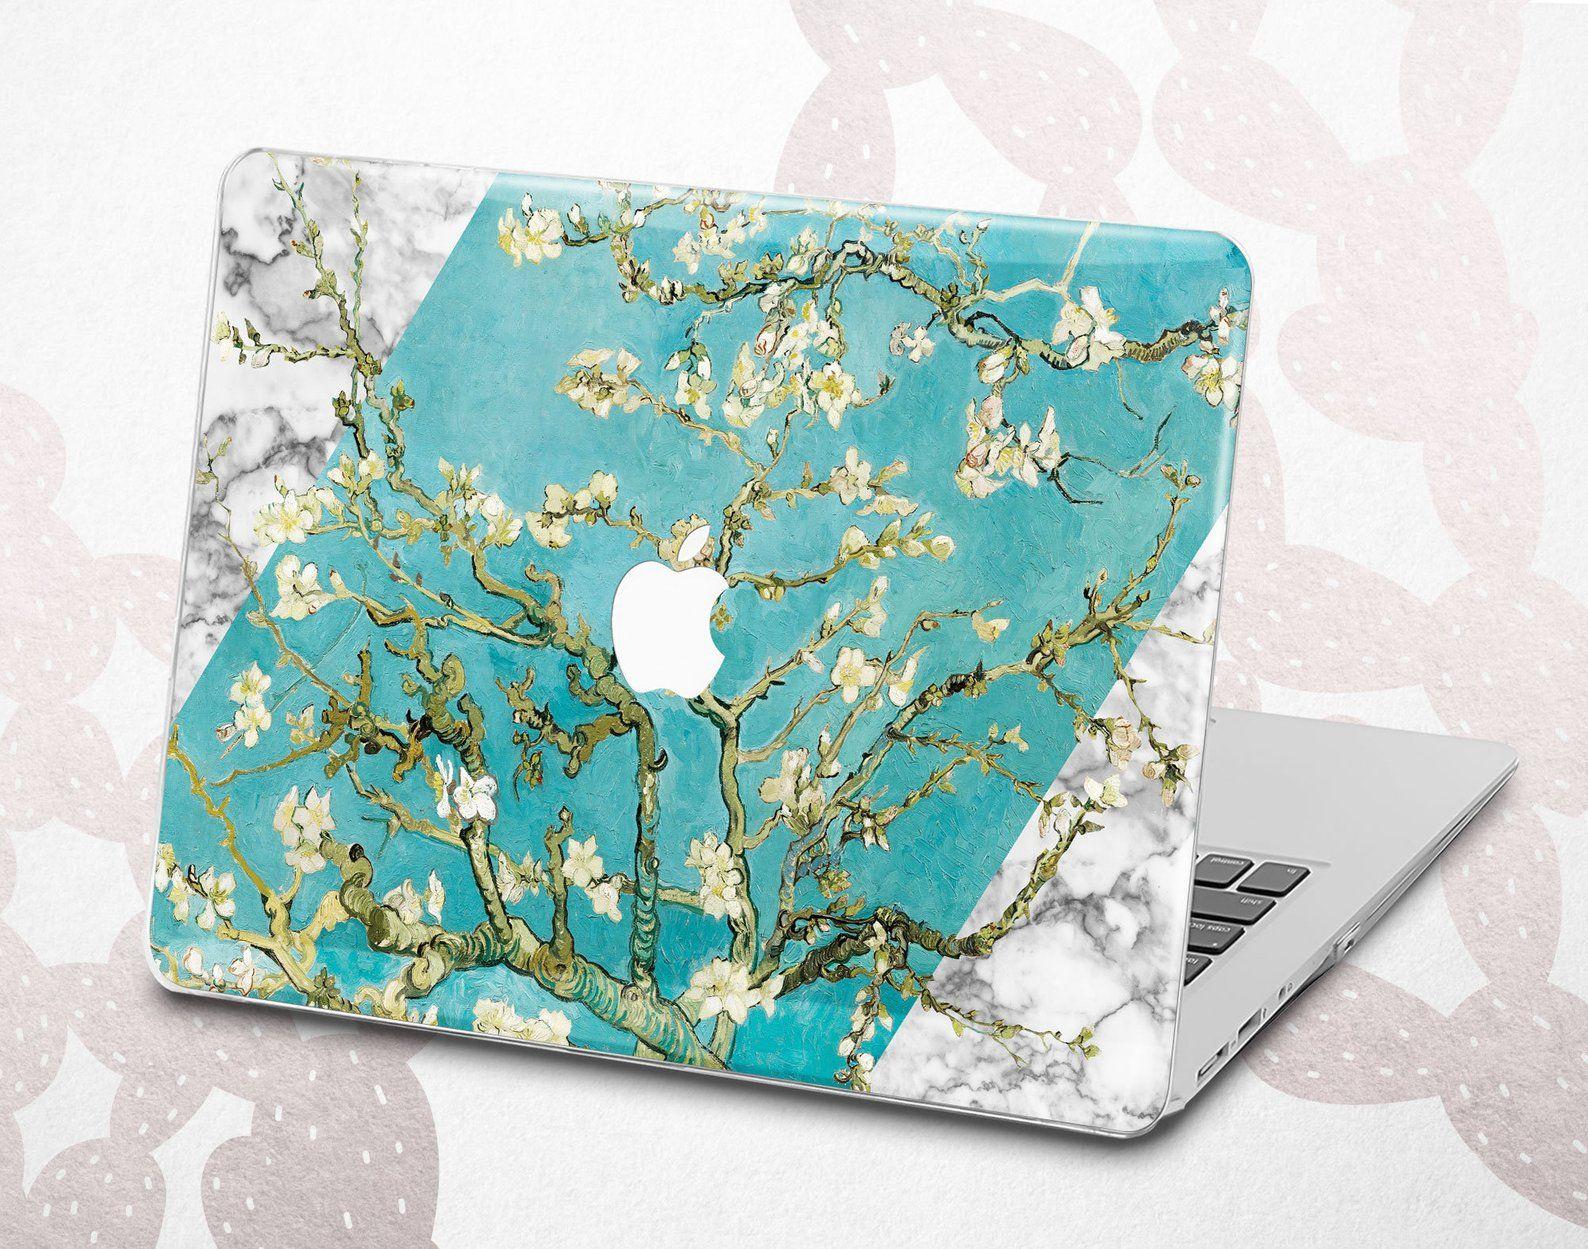 newest df48d deae5 Van Gogh Macbook case Almond Branches in Bloom Macbook Pro 13 inch ...